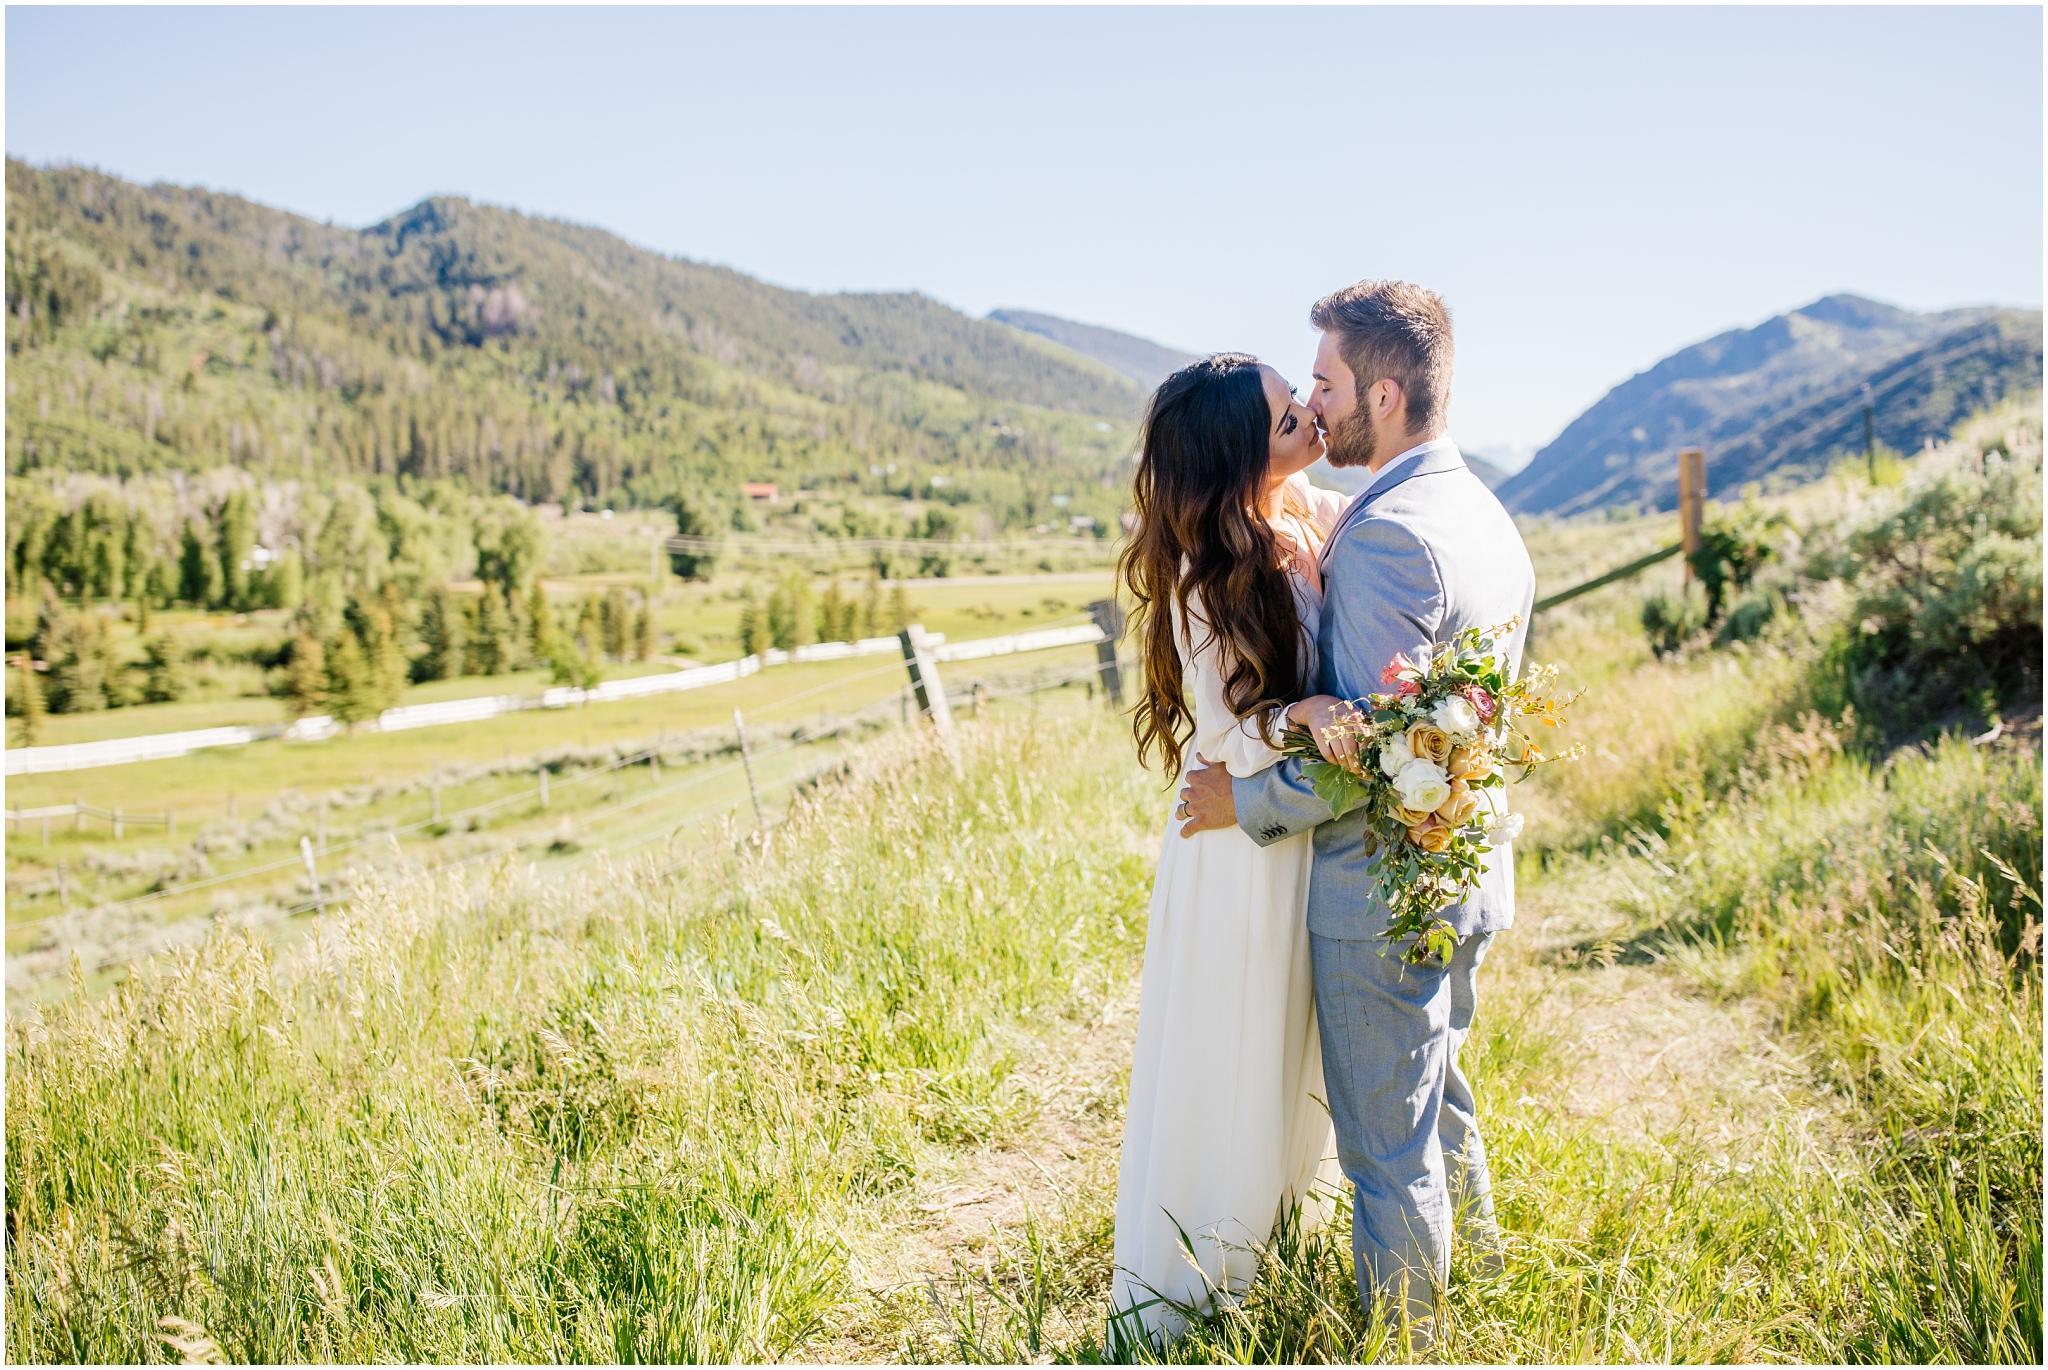 MountainShoot-34_Lizzie-B-Imagery-Utah-Wedding-Photographer-Salt-Lake-City-Park-City-Utah-County.jpg